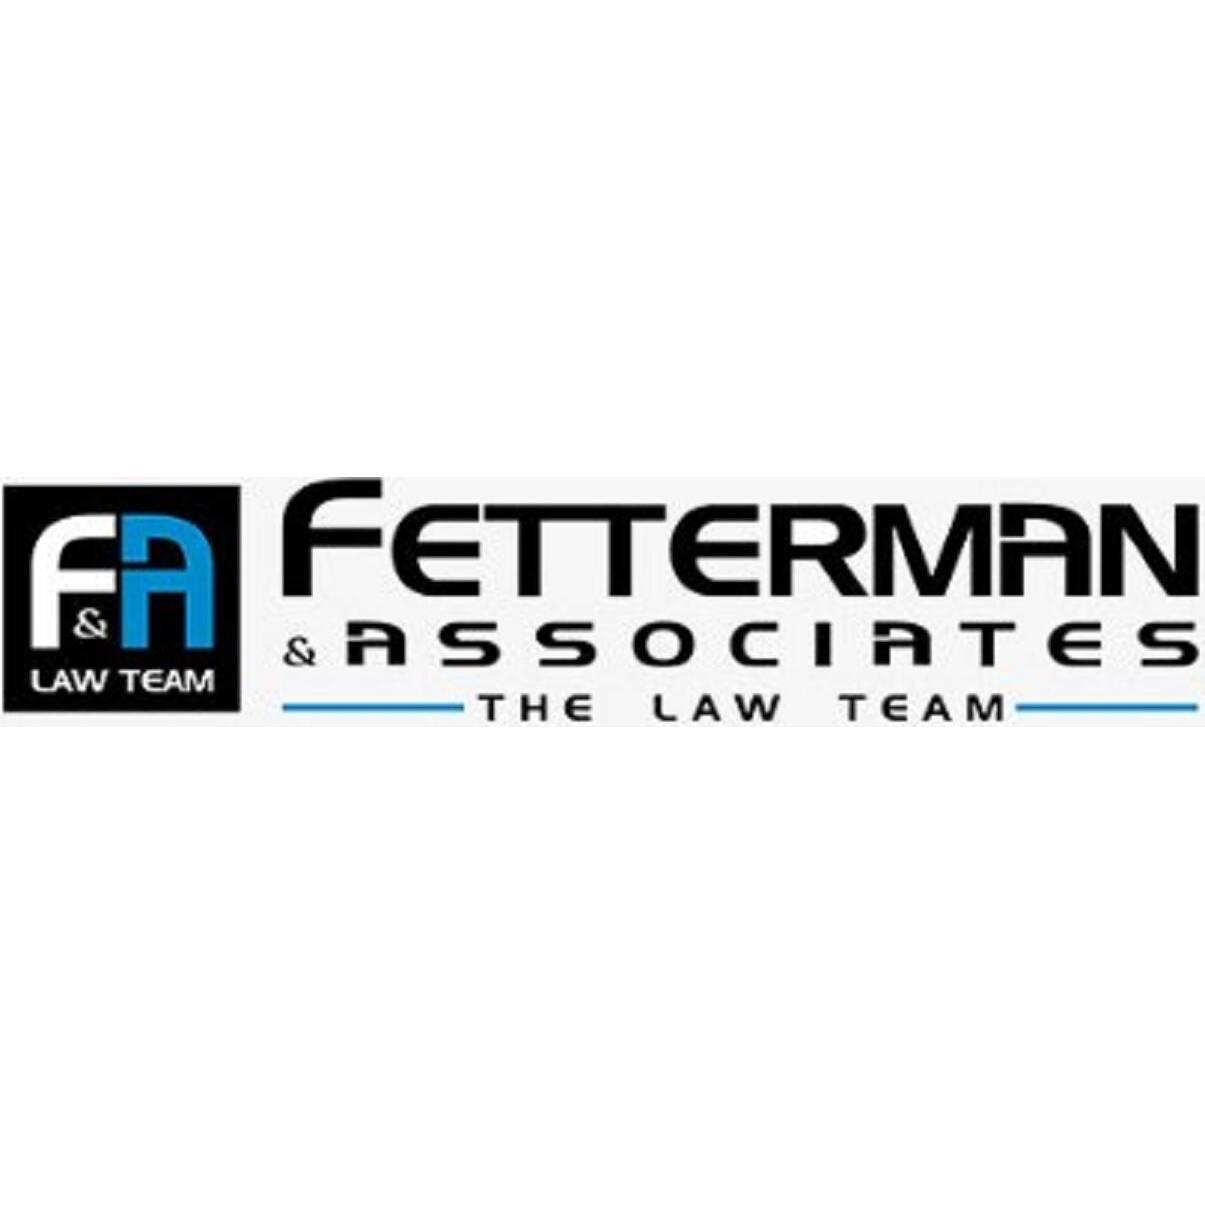 Fetterman & Associates, PA